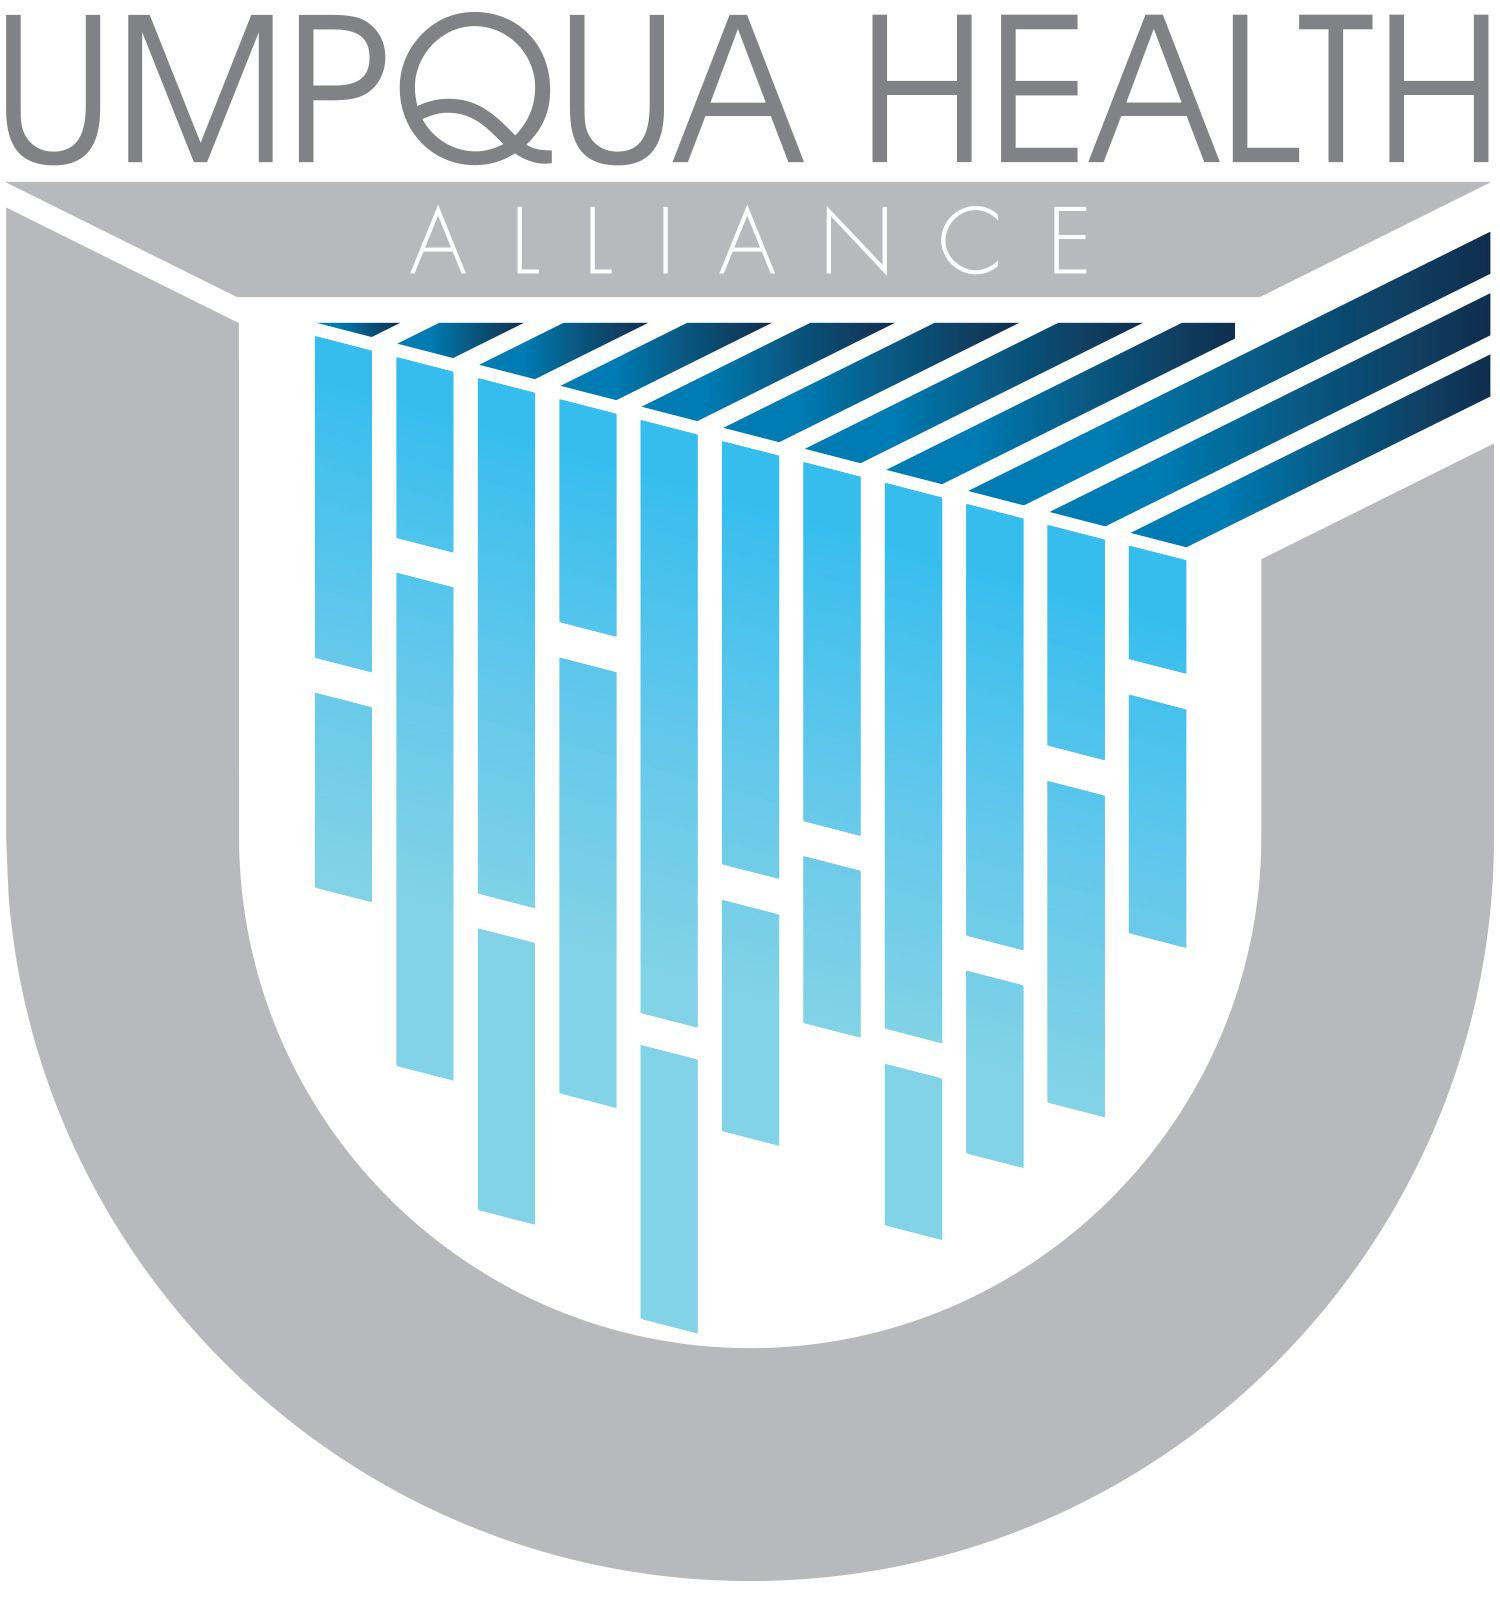 Umpqua Health Alliance